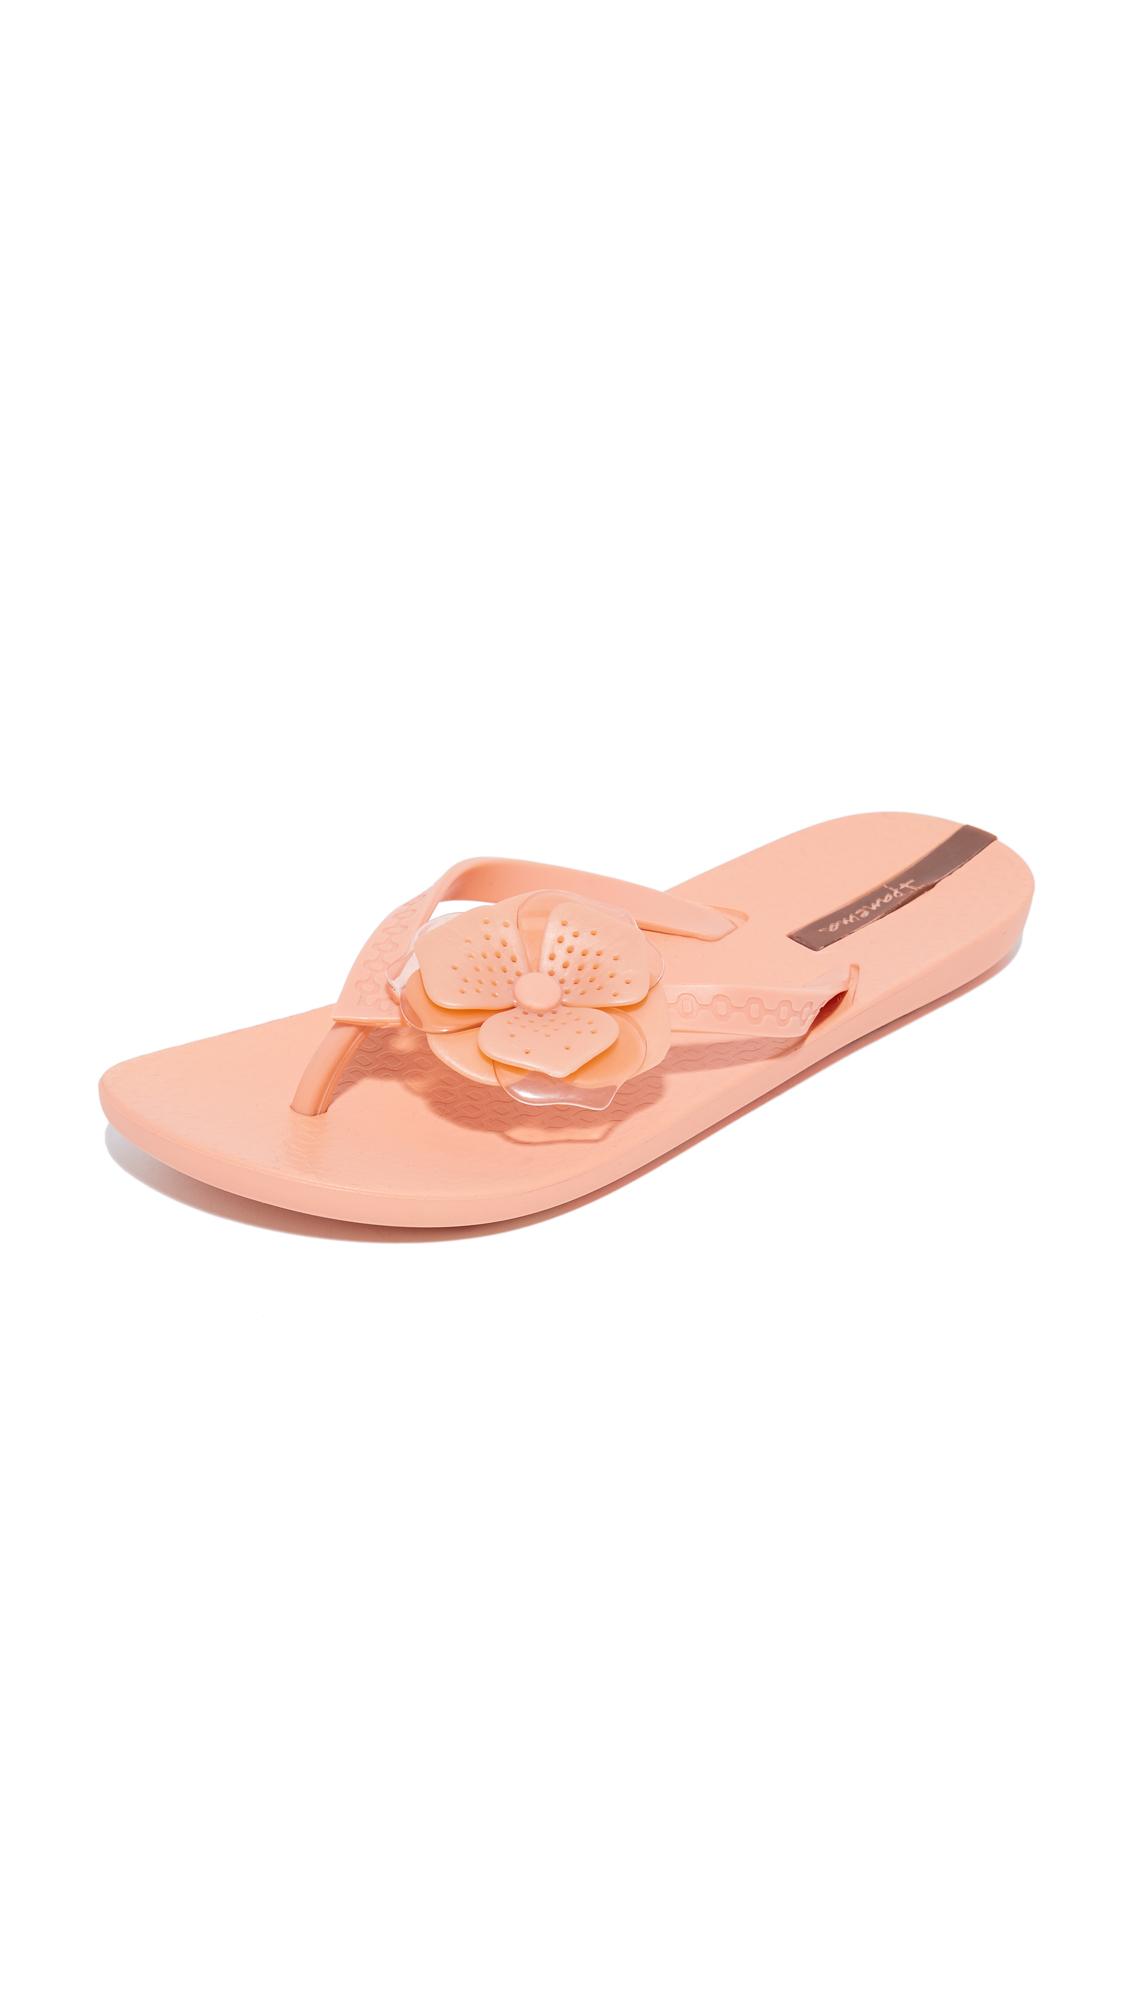 ipanema neo petal flip flops pink shoes online shopping at. Black Bedroom Furniture Sets. Home Design Ideas